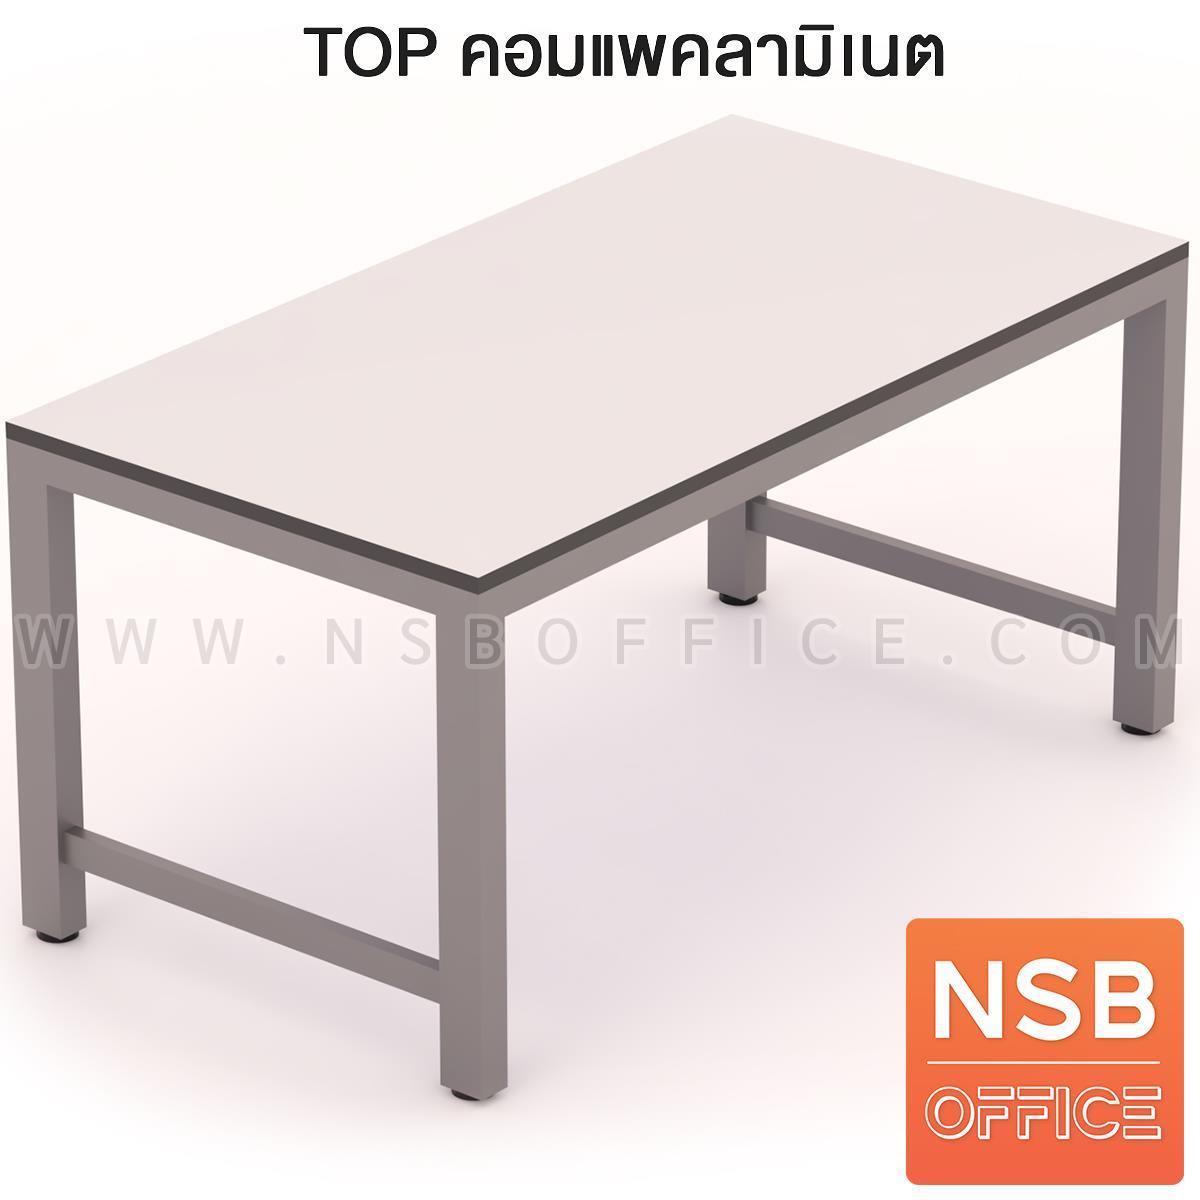 C12A020:โต๊ะปฏิบัติการ รุ่น Omega (โอเมก้า) ขนาด 150W*80D cm. หน้าท็อป HPL และ คอมแพคลามิเนต ขาเหล็กเหลี่ยม